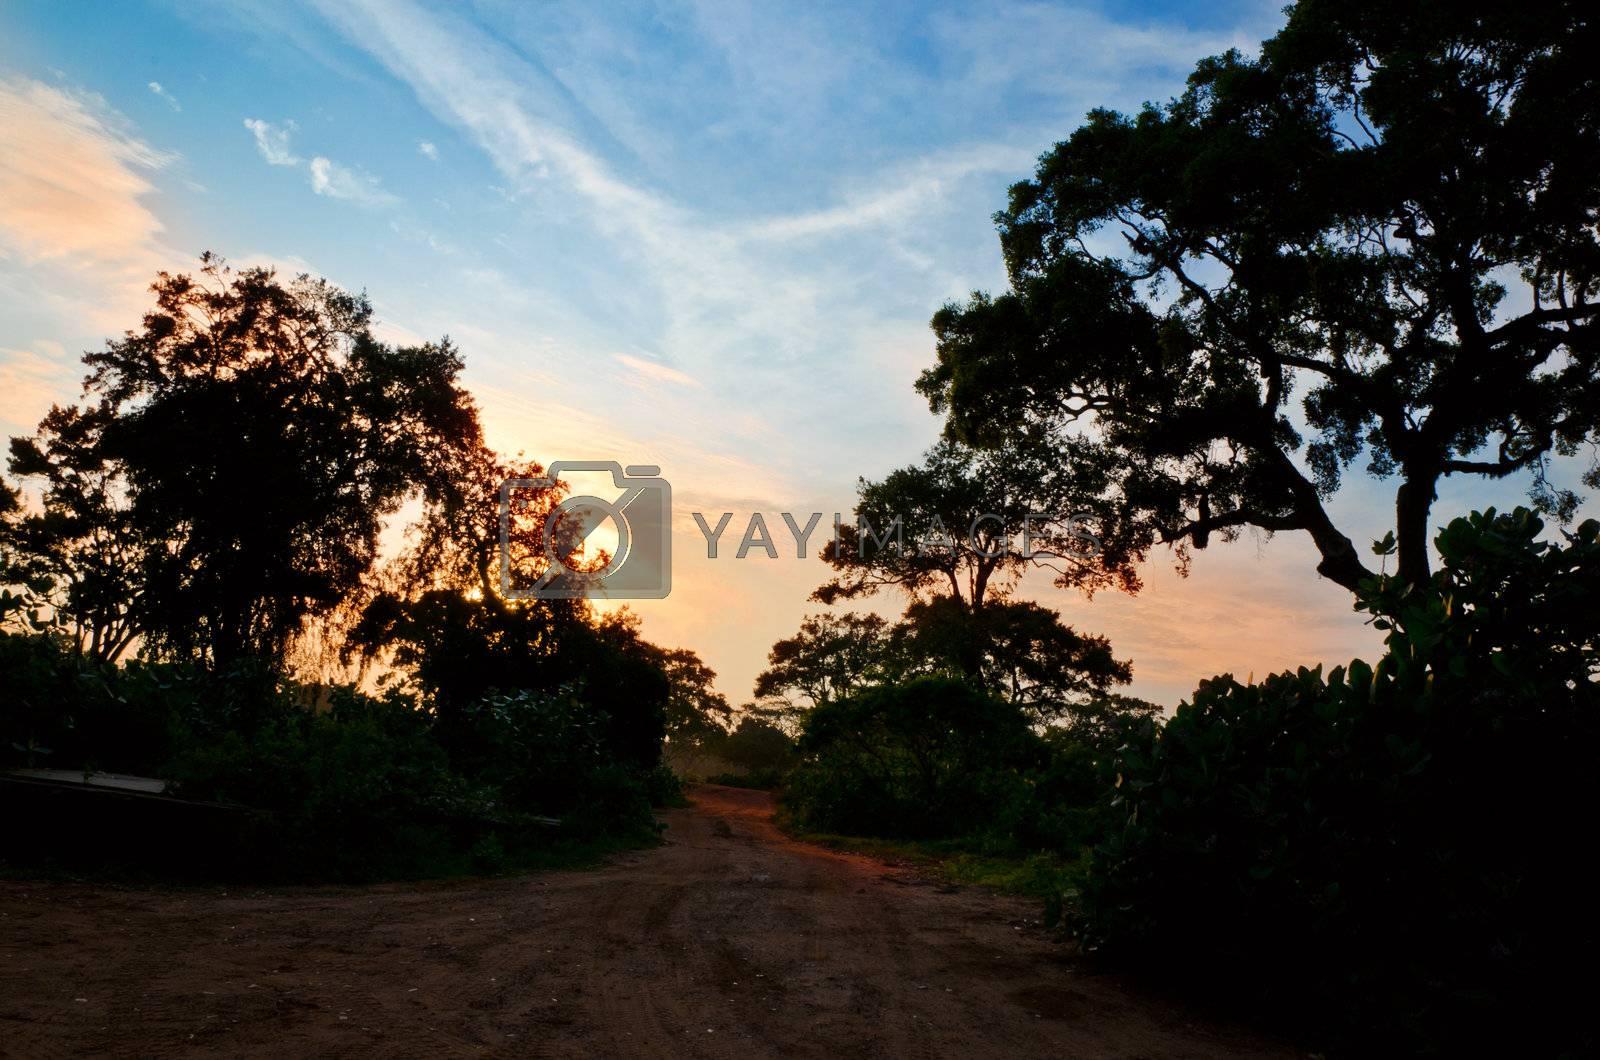 car on a dirt road equatorial countries